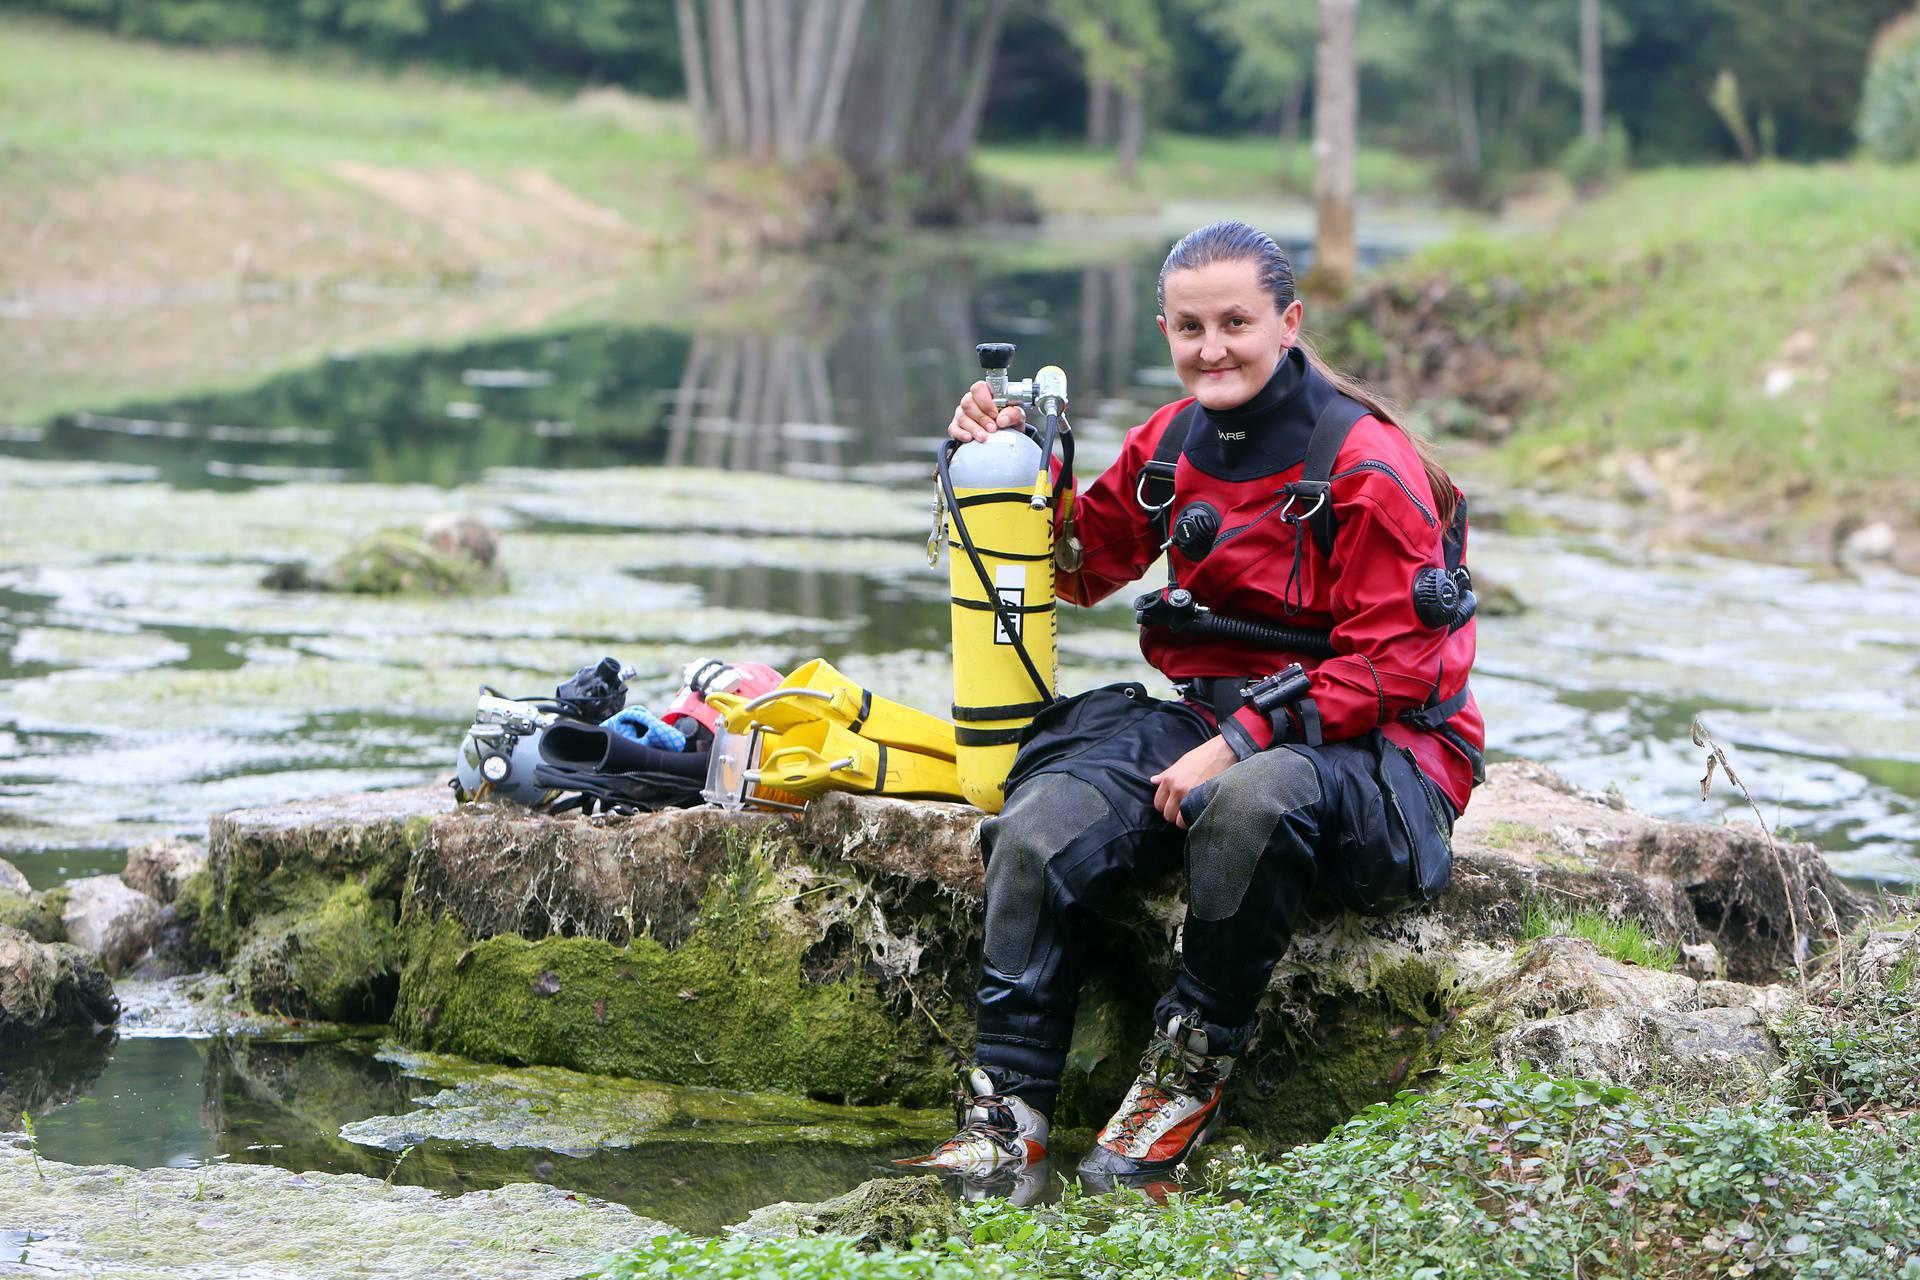 'Žena zmaj' Đenis iz HGSS-a: Na 40 metara dubine spašavala sam žrtve, to je jako opasno...